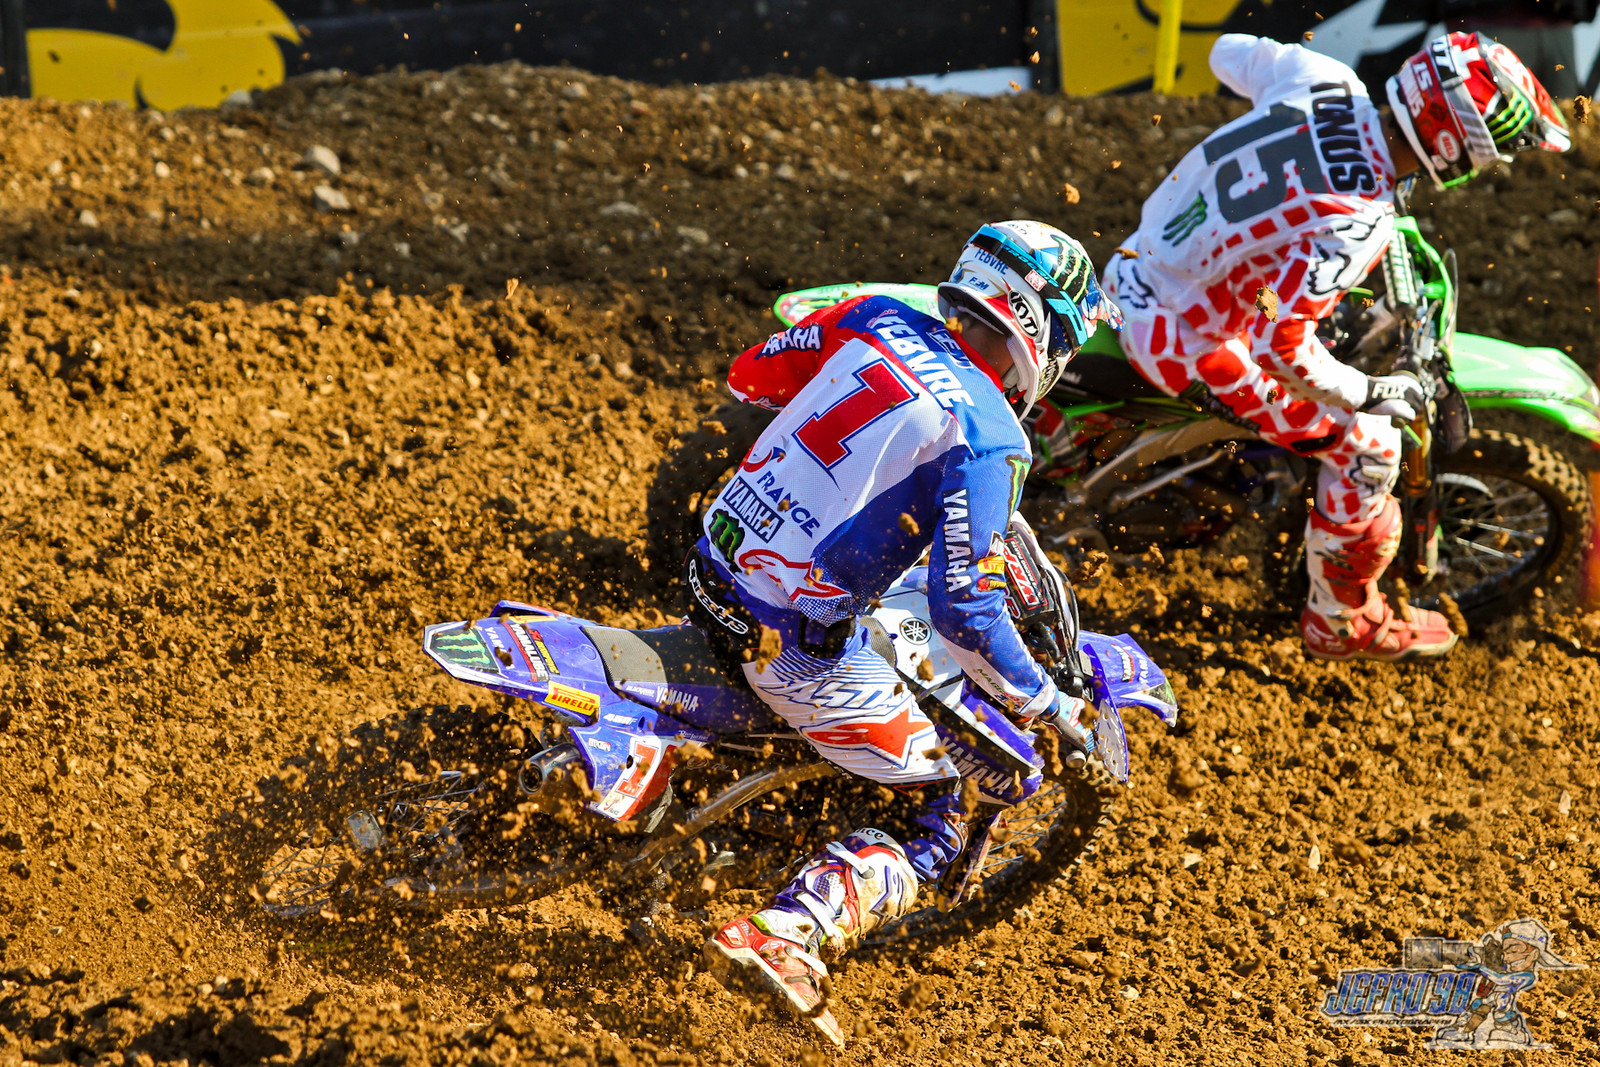 Romain Febvre & Arnaud Tonus - PhotoGallery: MXoN Sunday - Motocross Pictures - Vital MX